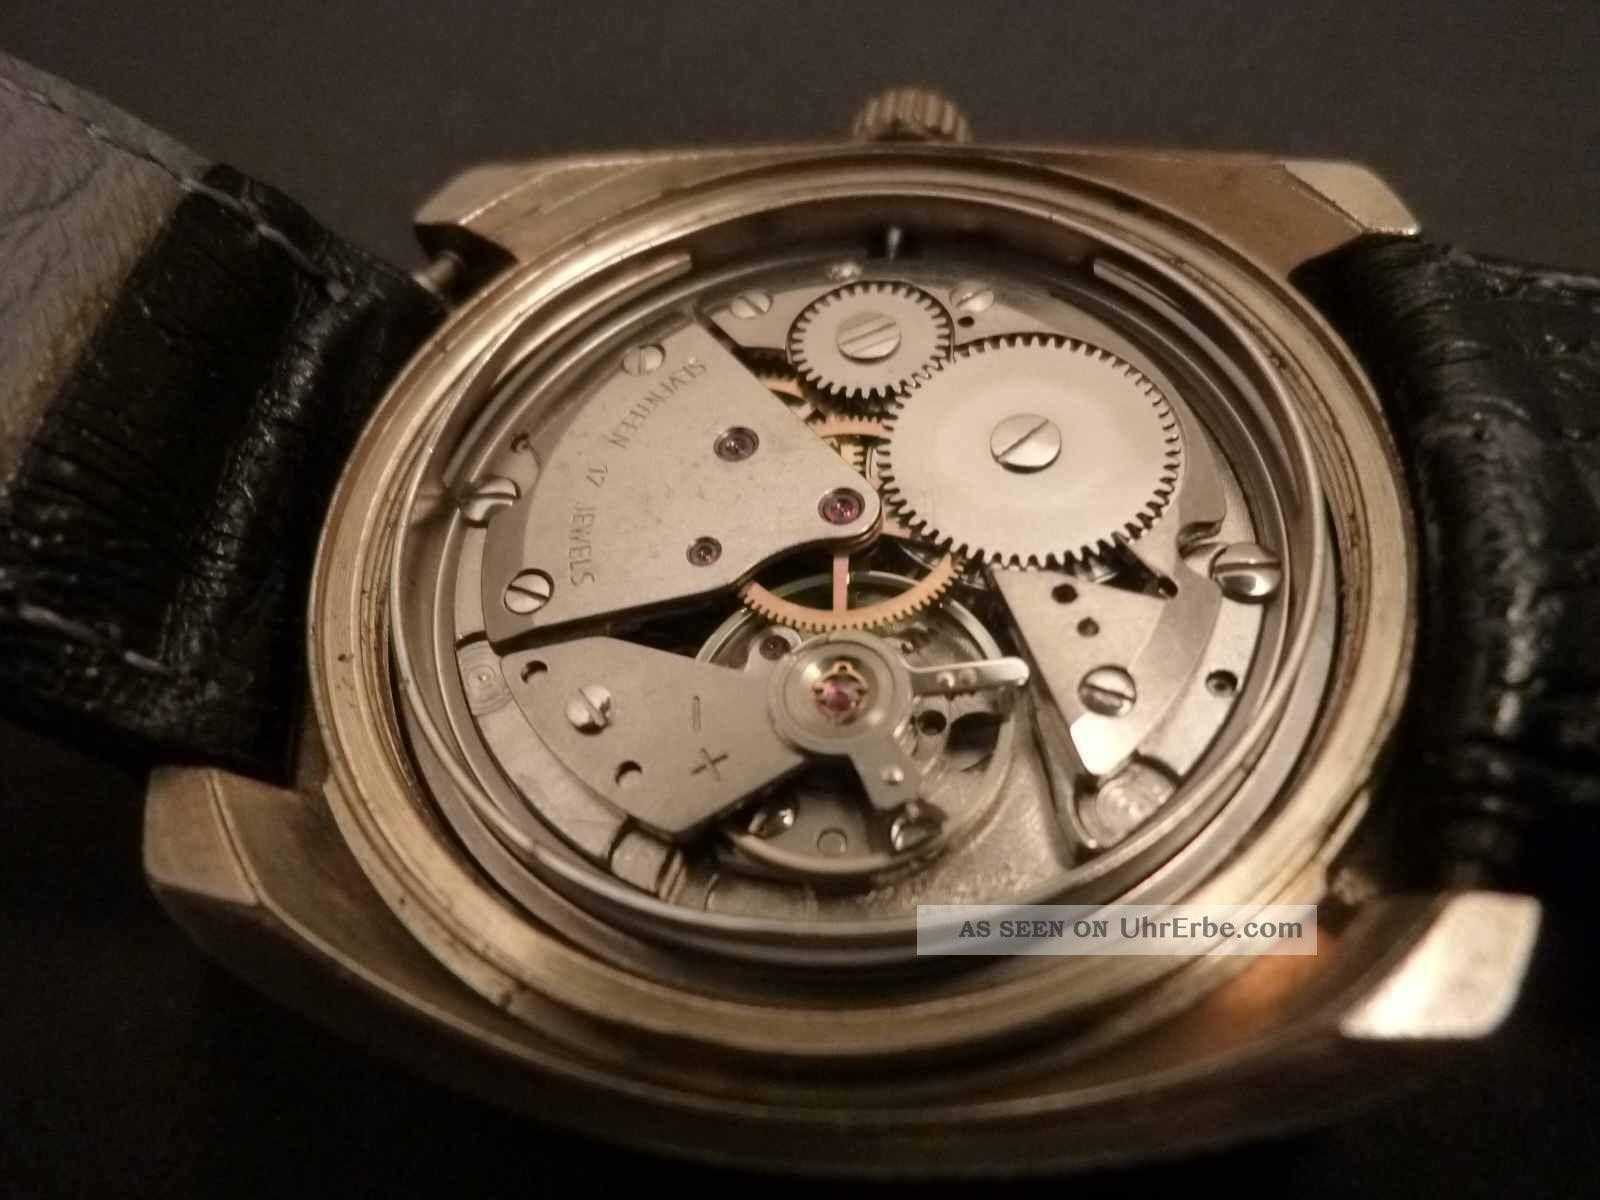 Dugena Classic Mit Interessantem Werk 7422/2 Armbanduhren Bild